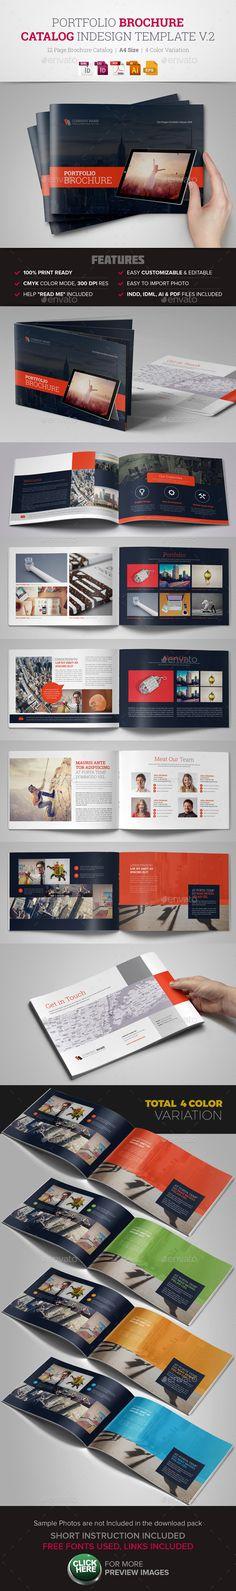 Portfolio Brochure InDesign Template v2 Creative, Clean and Modern Portfolio Brochure Template, ready to use for Corporate, Busine